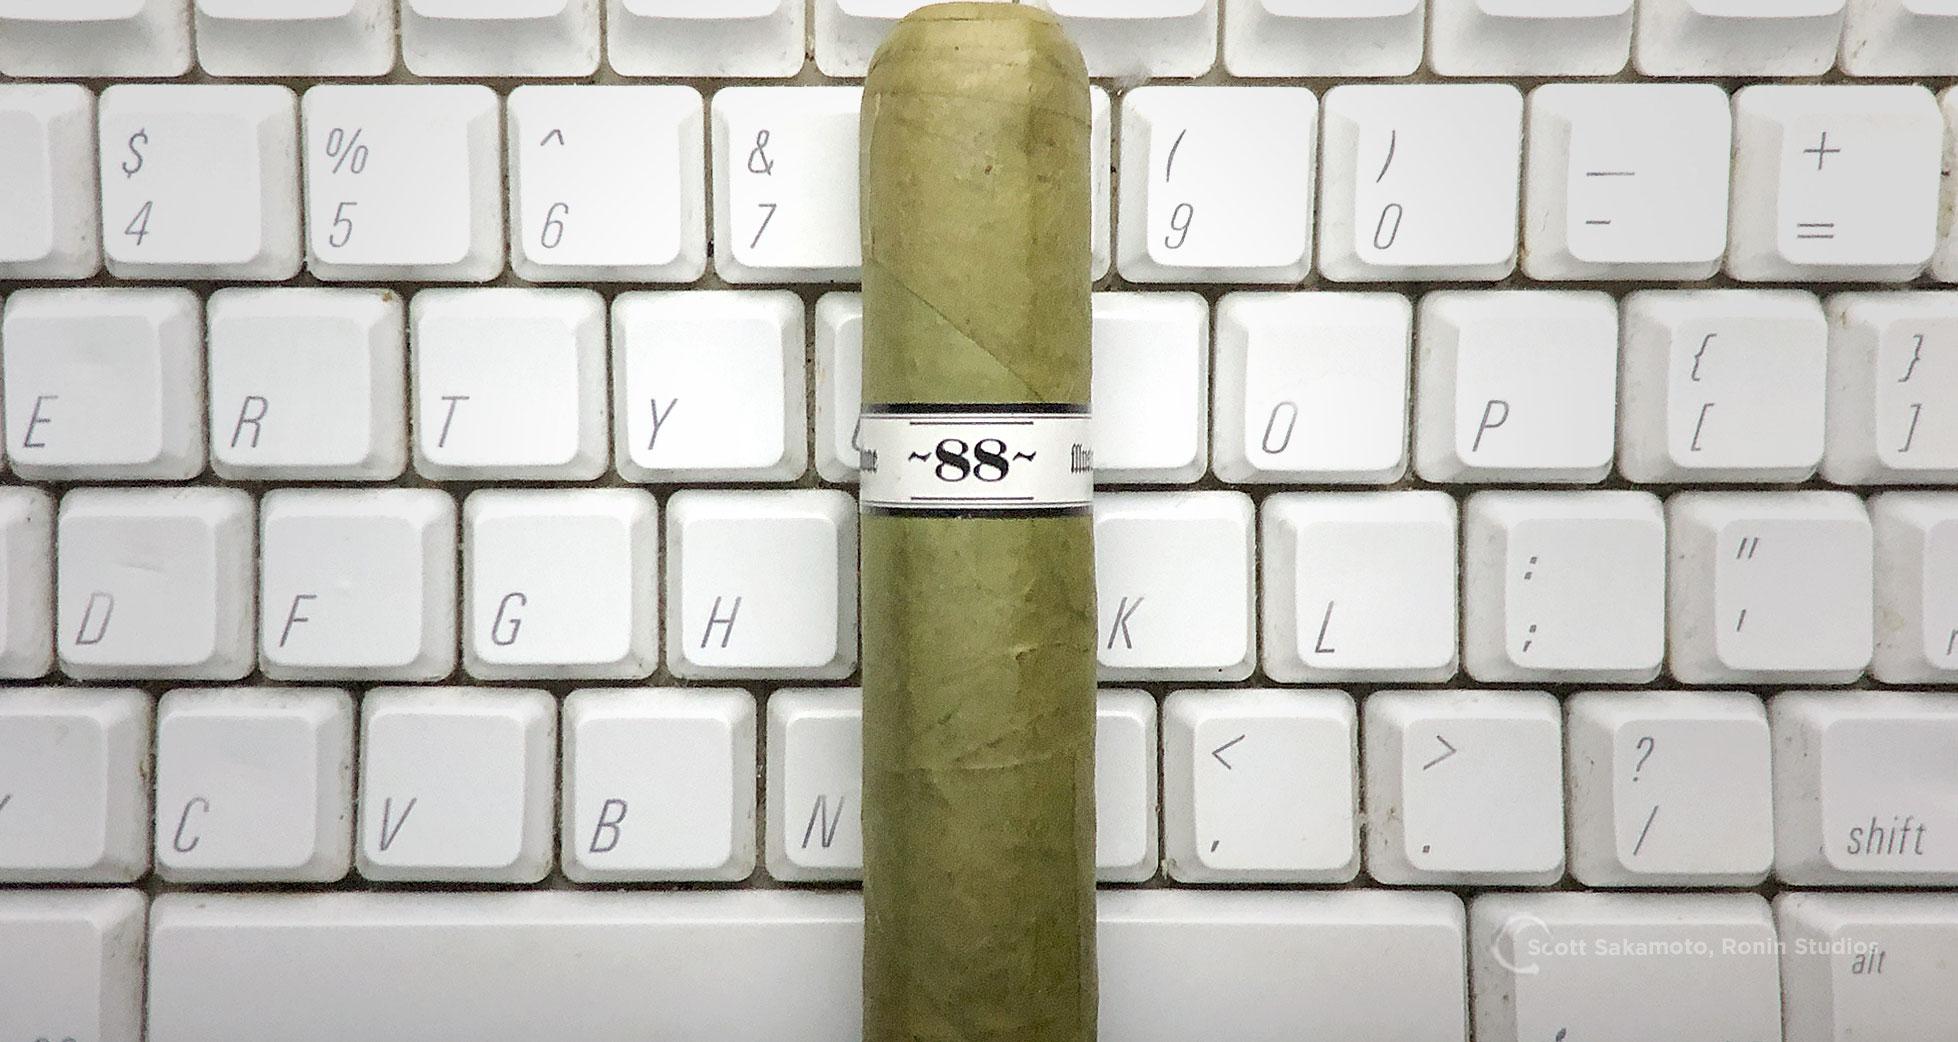 ~88~, Illusione Candela, Illusione Cigars, Nicaraguan, Nicaraguan Candela